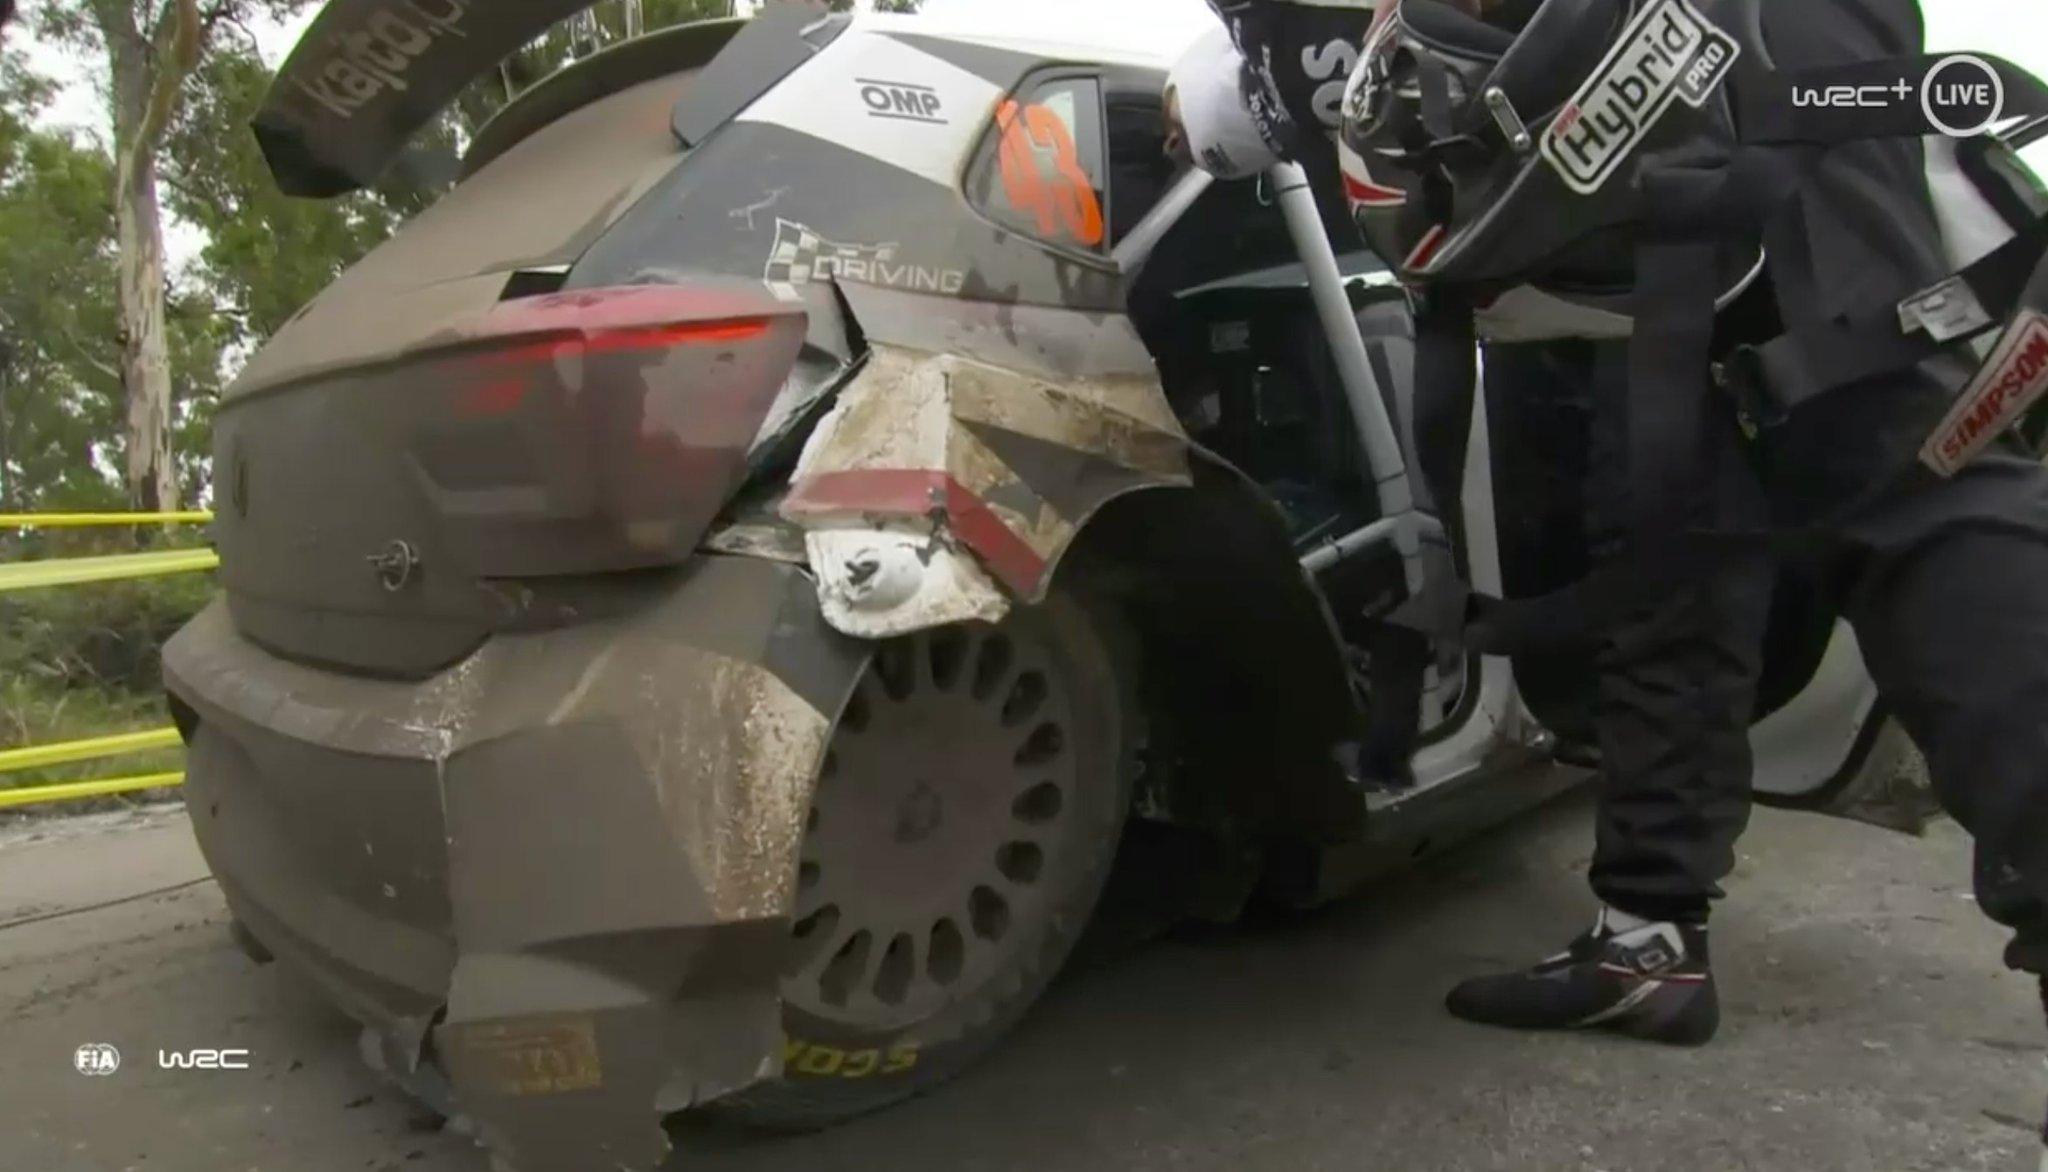 WRC: 39º XION Rallye Argentina [25-28 Abril] - Página 3 54465_d5fyzucx4aaxydm